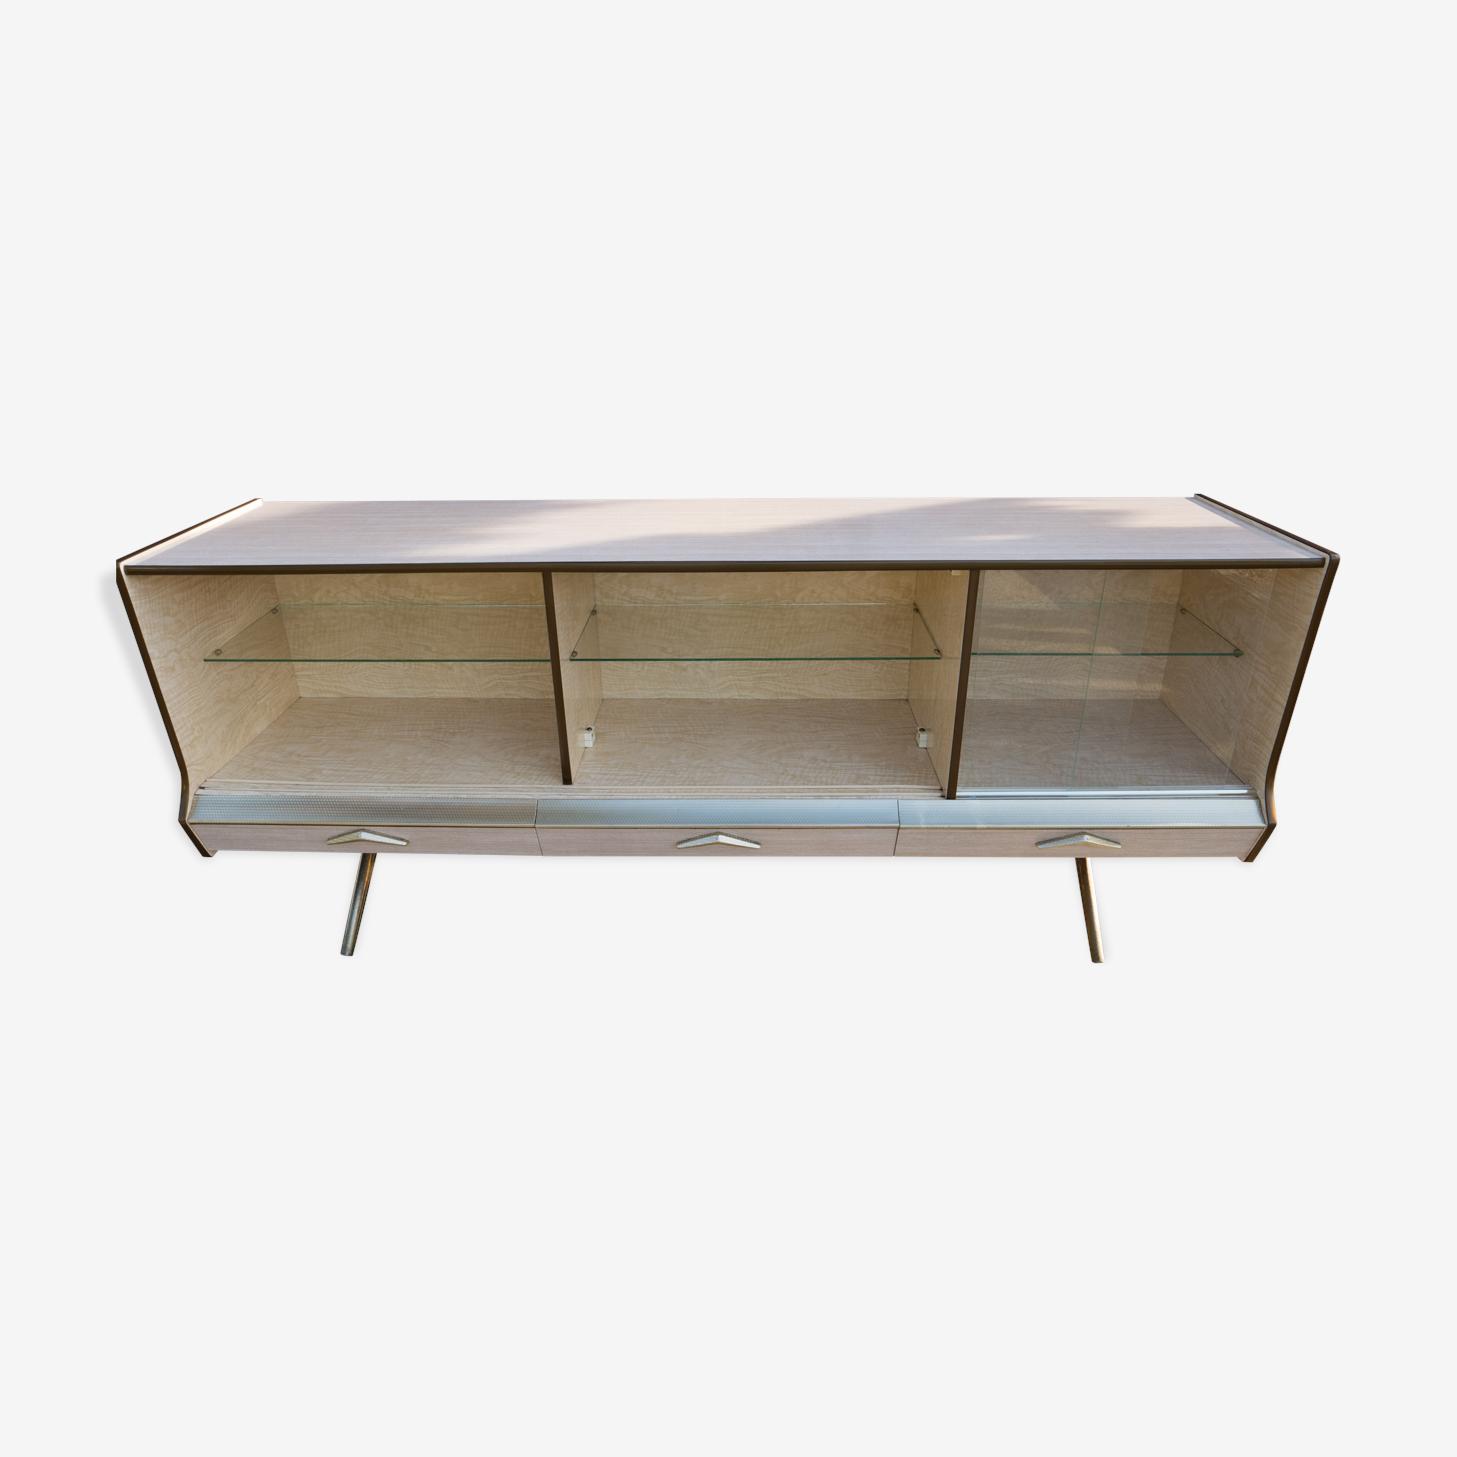 Sideboard in formica, open